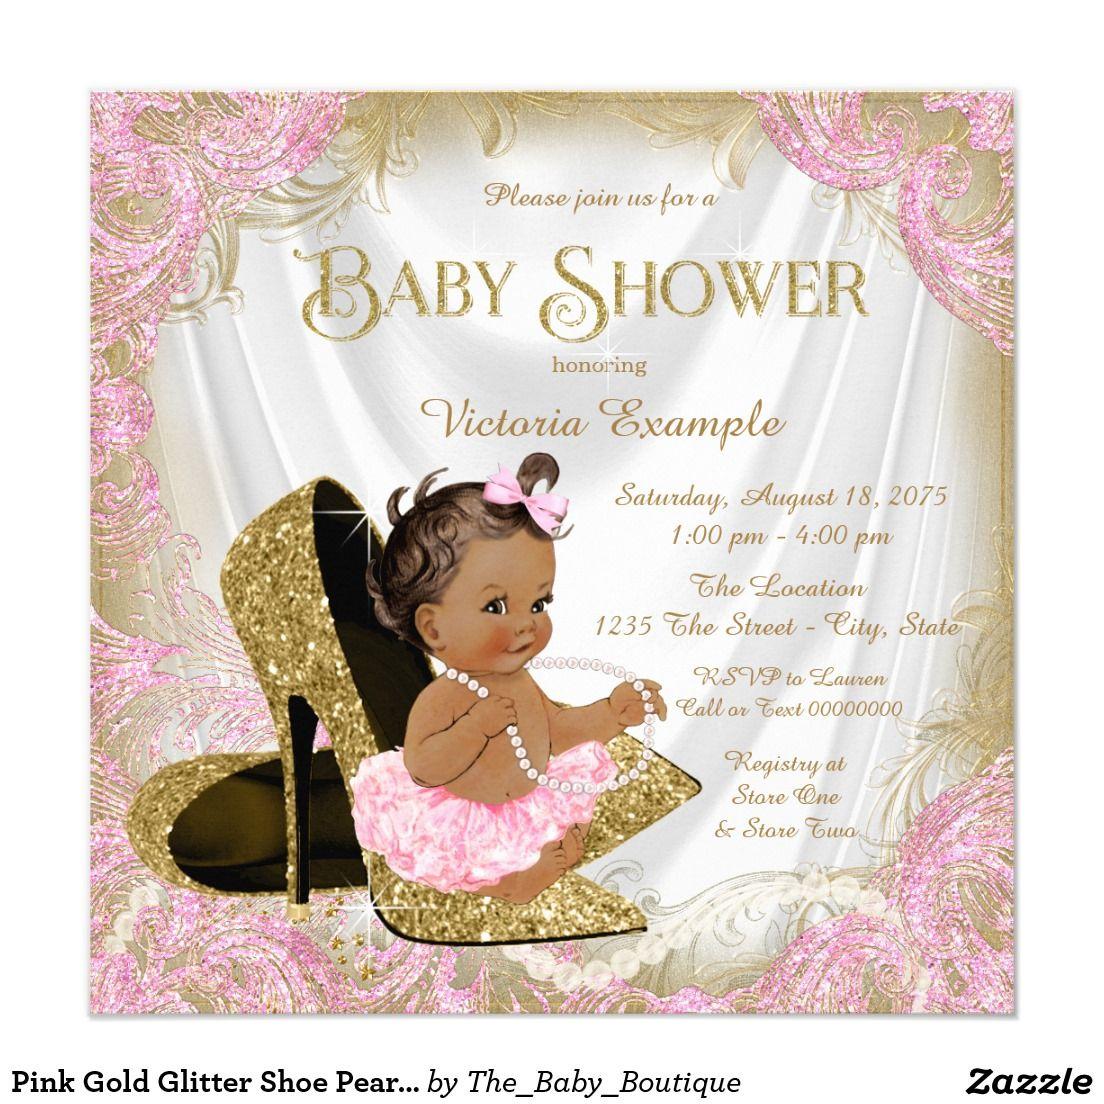 Pink Gold Glitter Shoe Pearl Ethnic Baby Shower Invitation | Girl ...